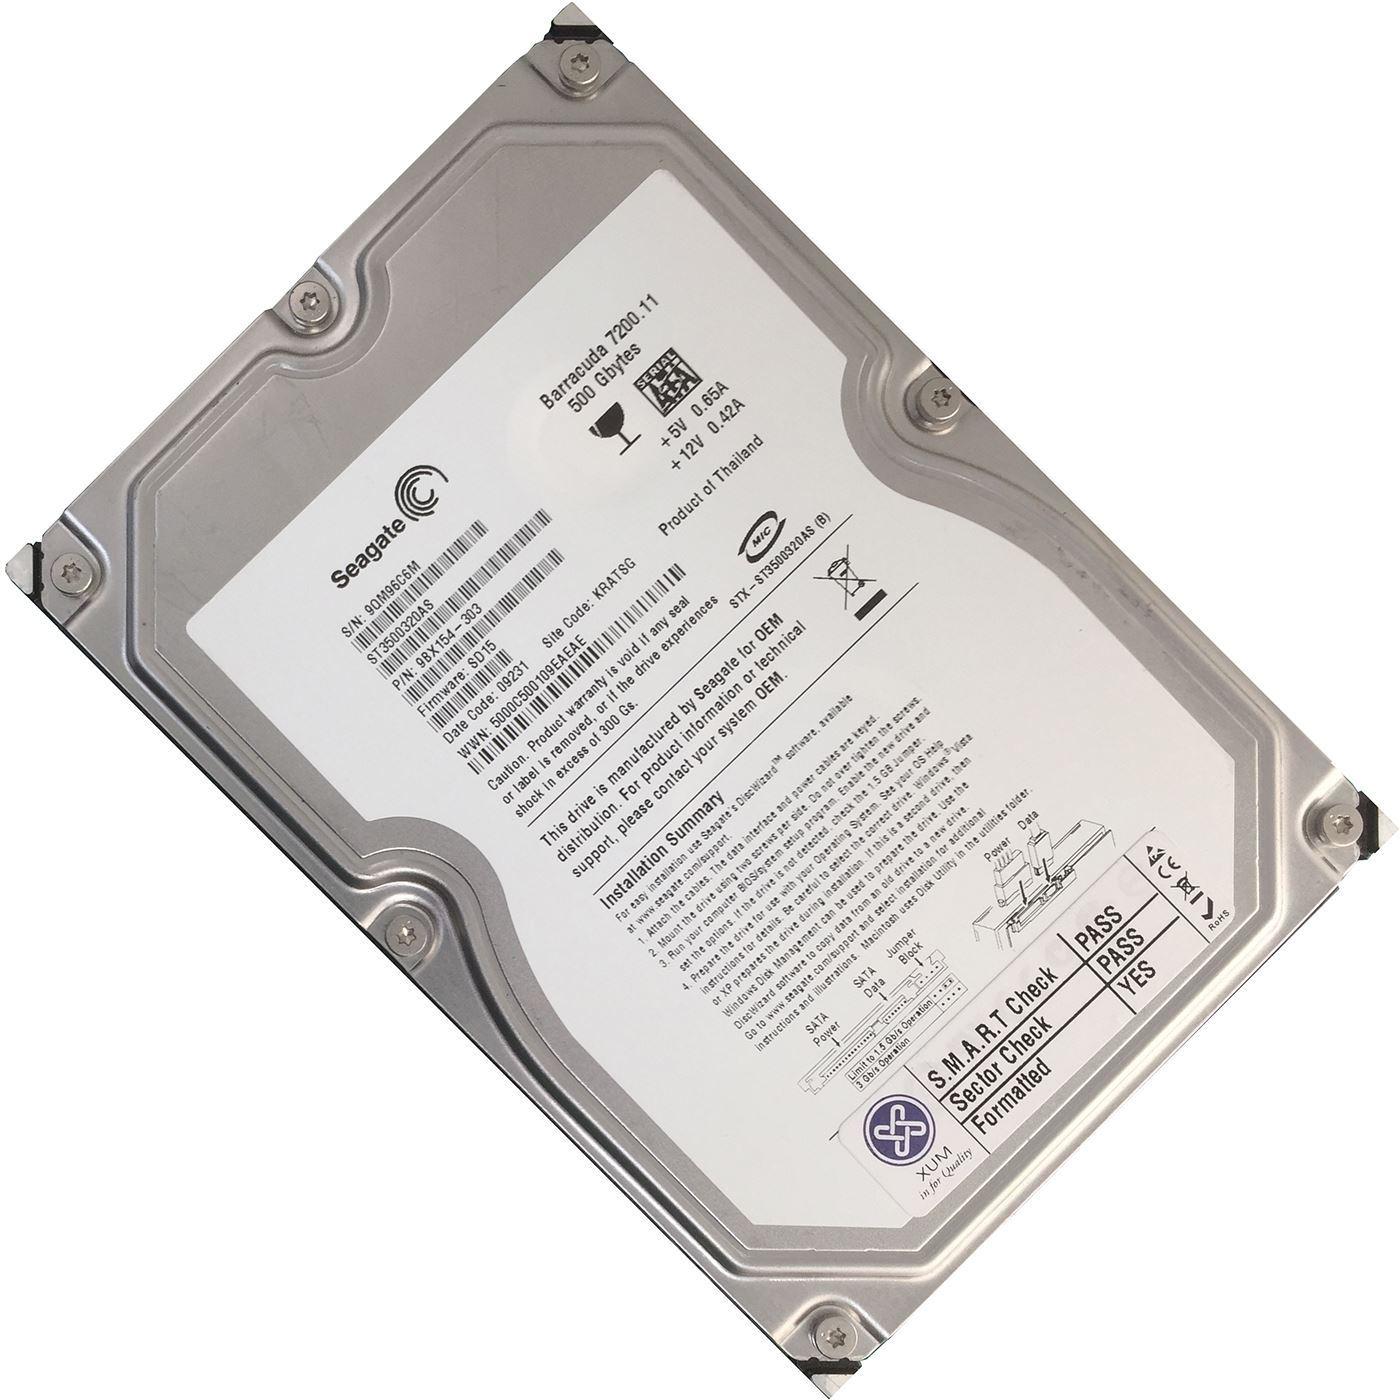 500GB-640GB-750GB-1TB-2TB-3TB-4TB-6TB-8TB-10TB-3-5-034-disco-duro-SATA-HDD-Lote miniatura 4